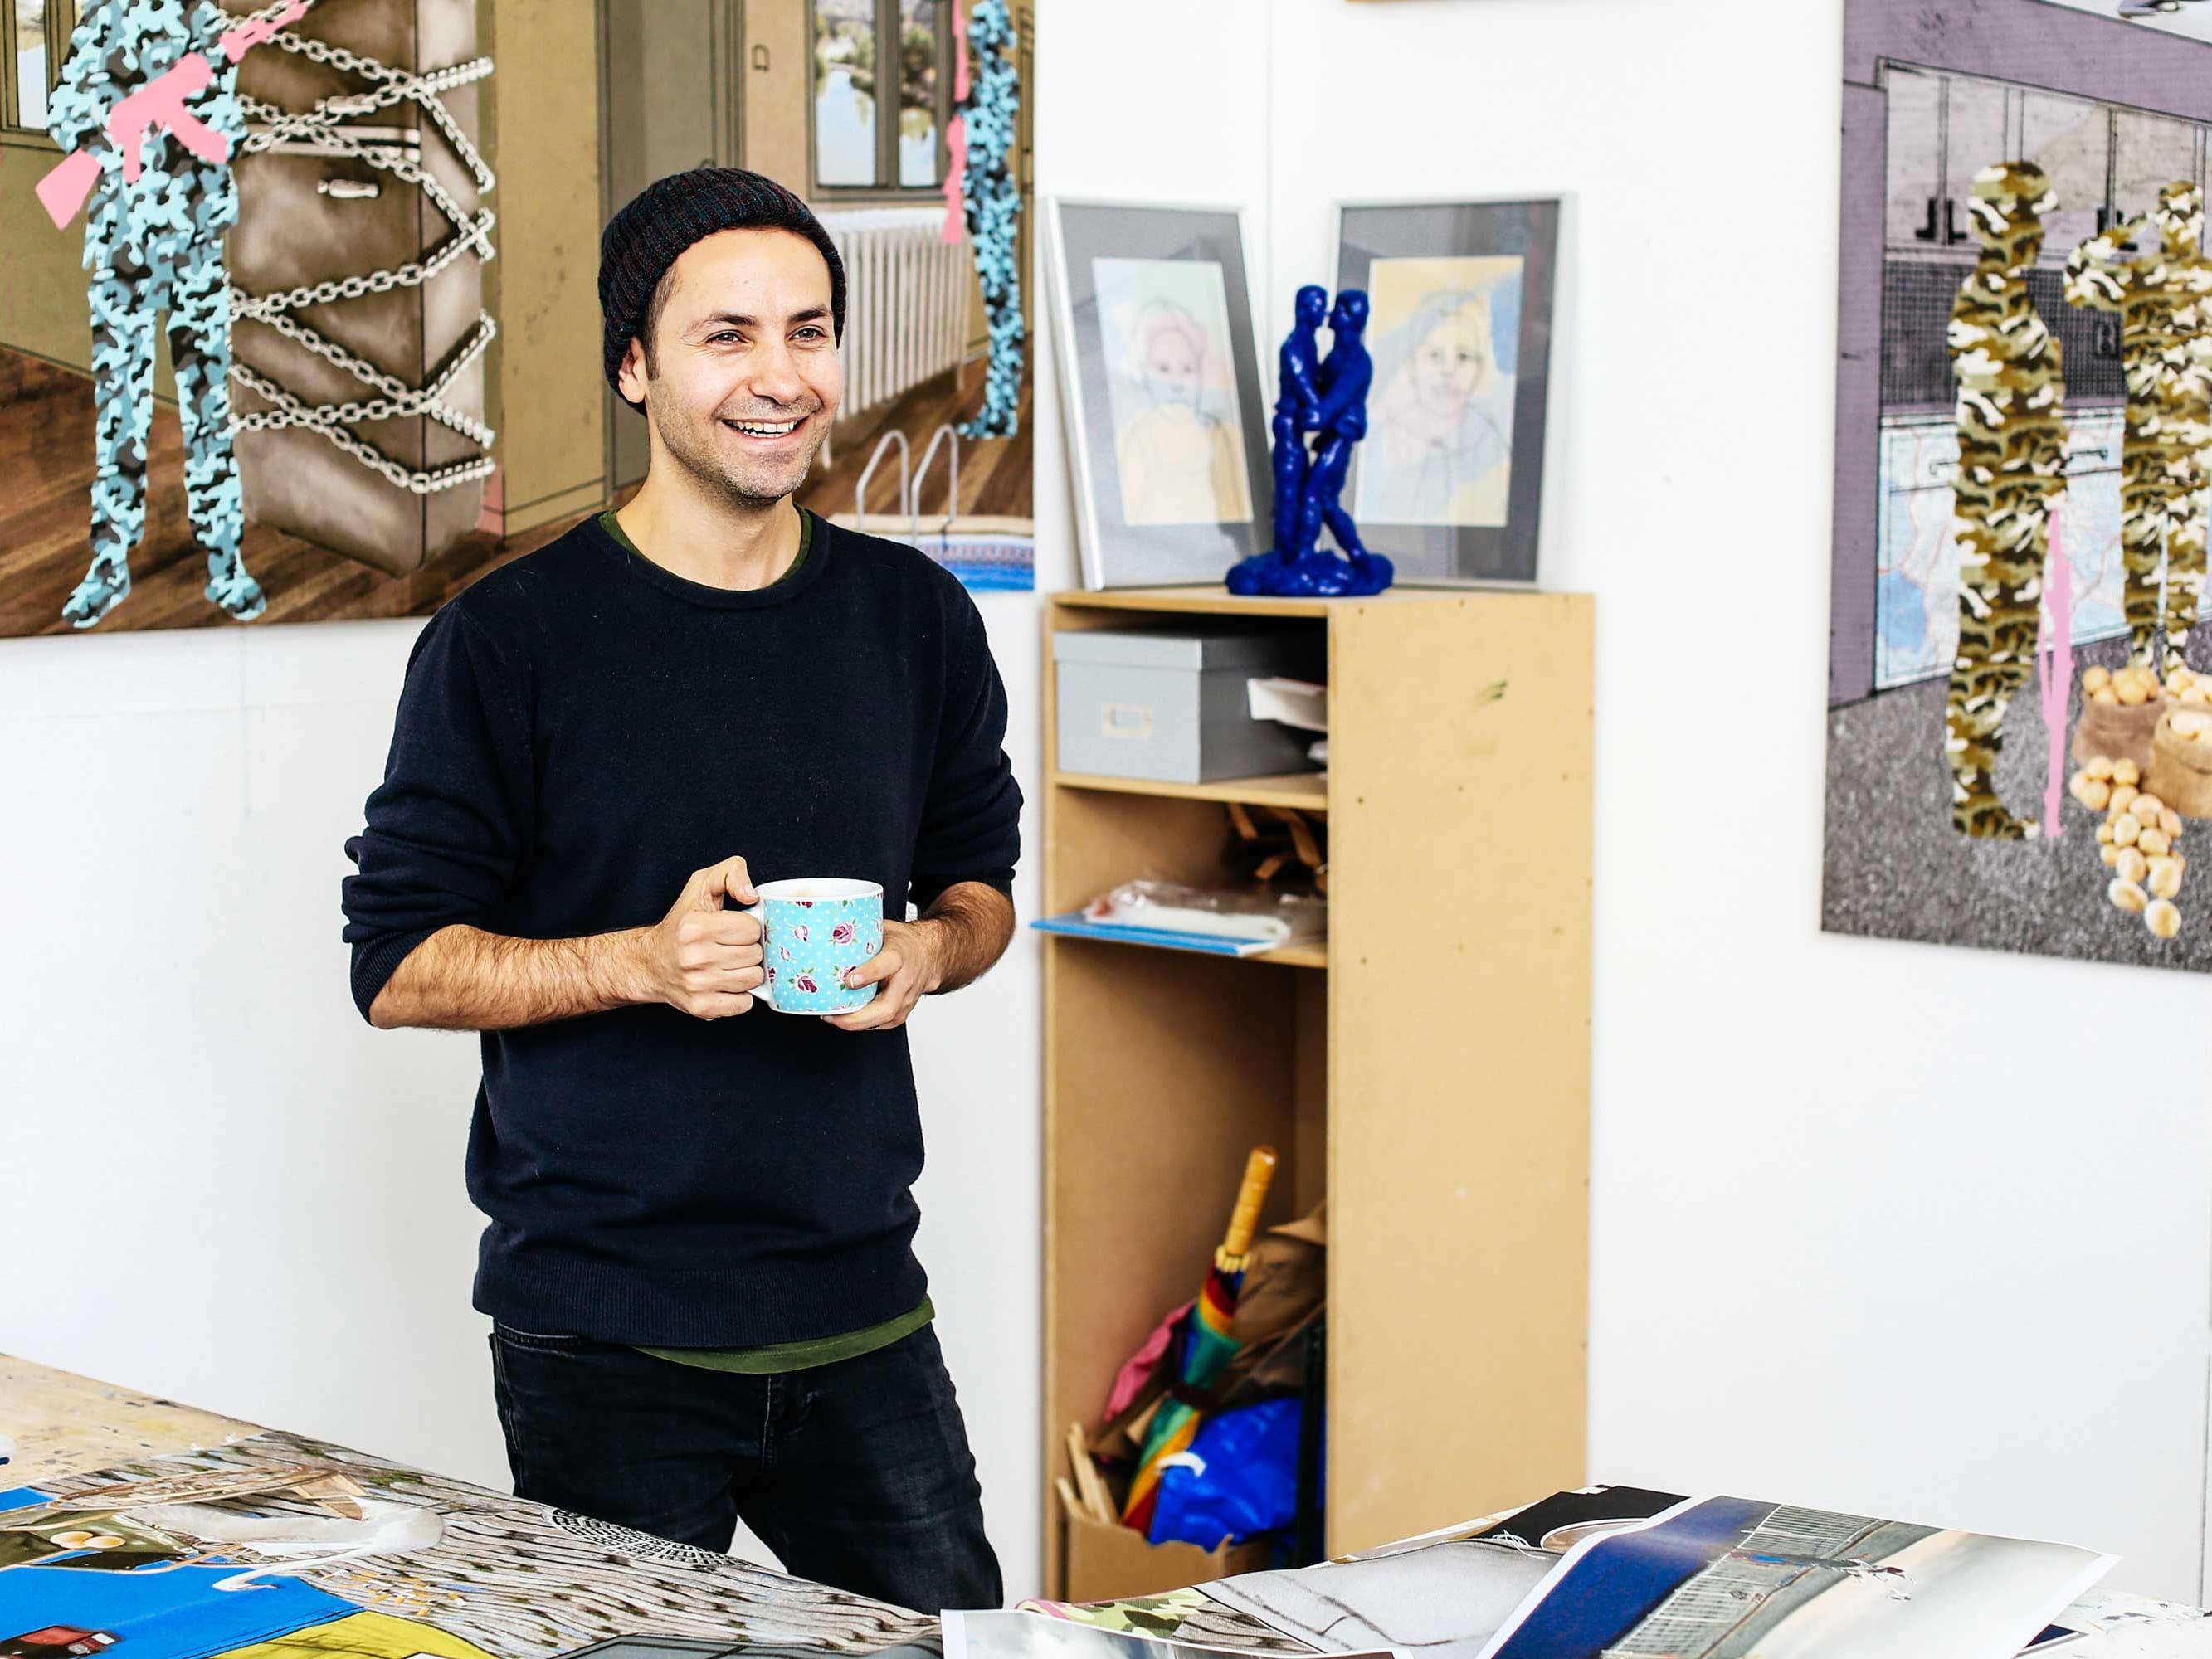 A student in a fine art studio